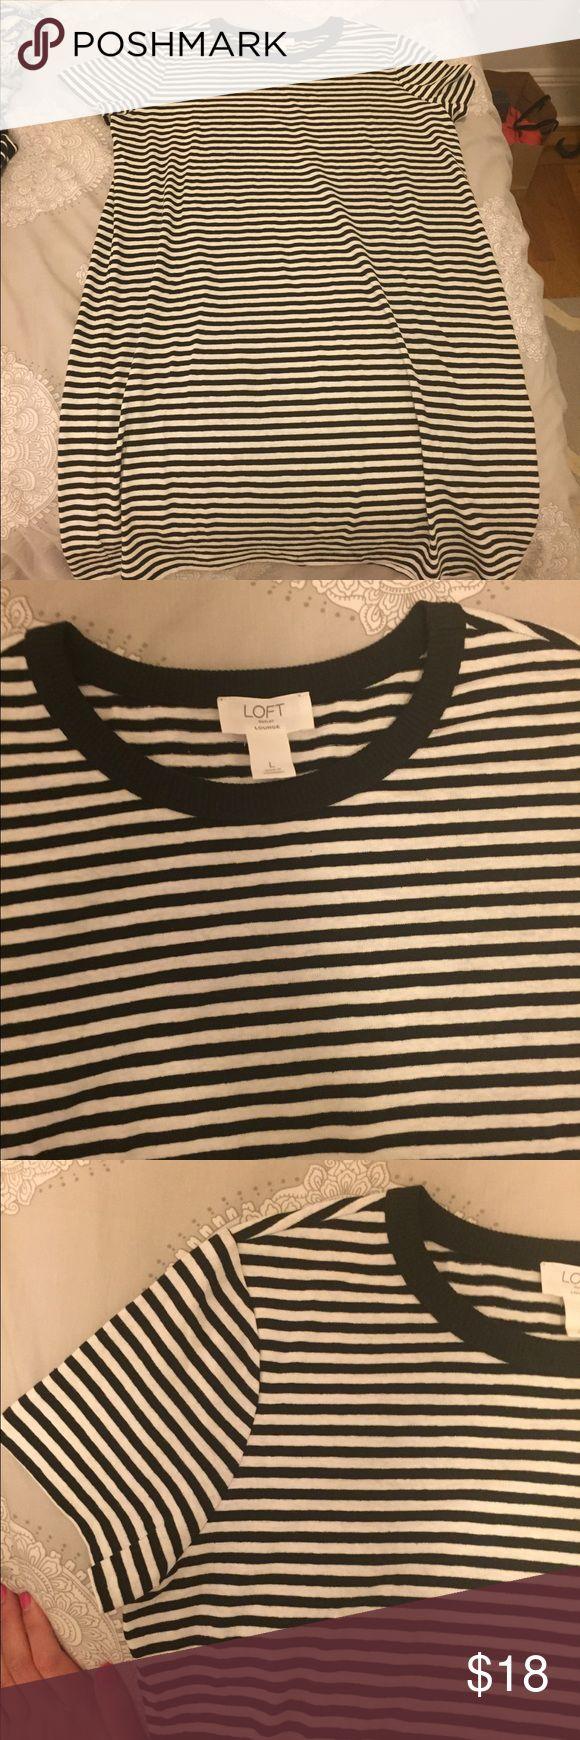 NWOT LOFT Outlet Striped T Shirt Dress Large Adorable short sleeve striped t shirt dress. Size Large. Never been worn! LOFT Dresses Mini